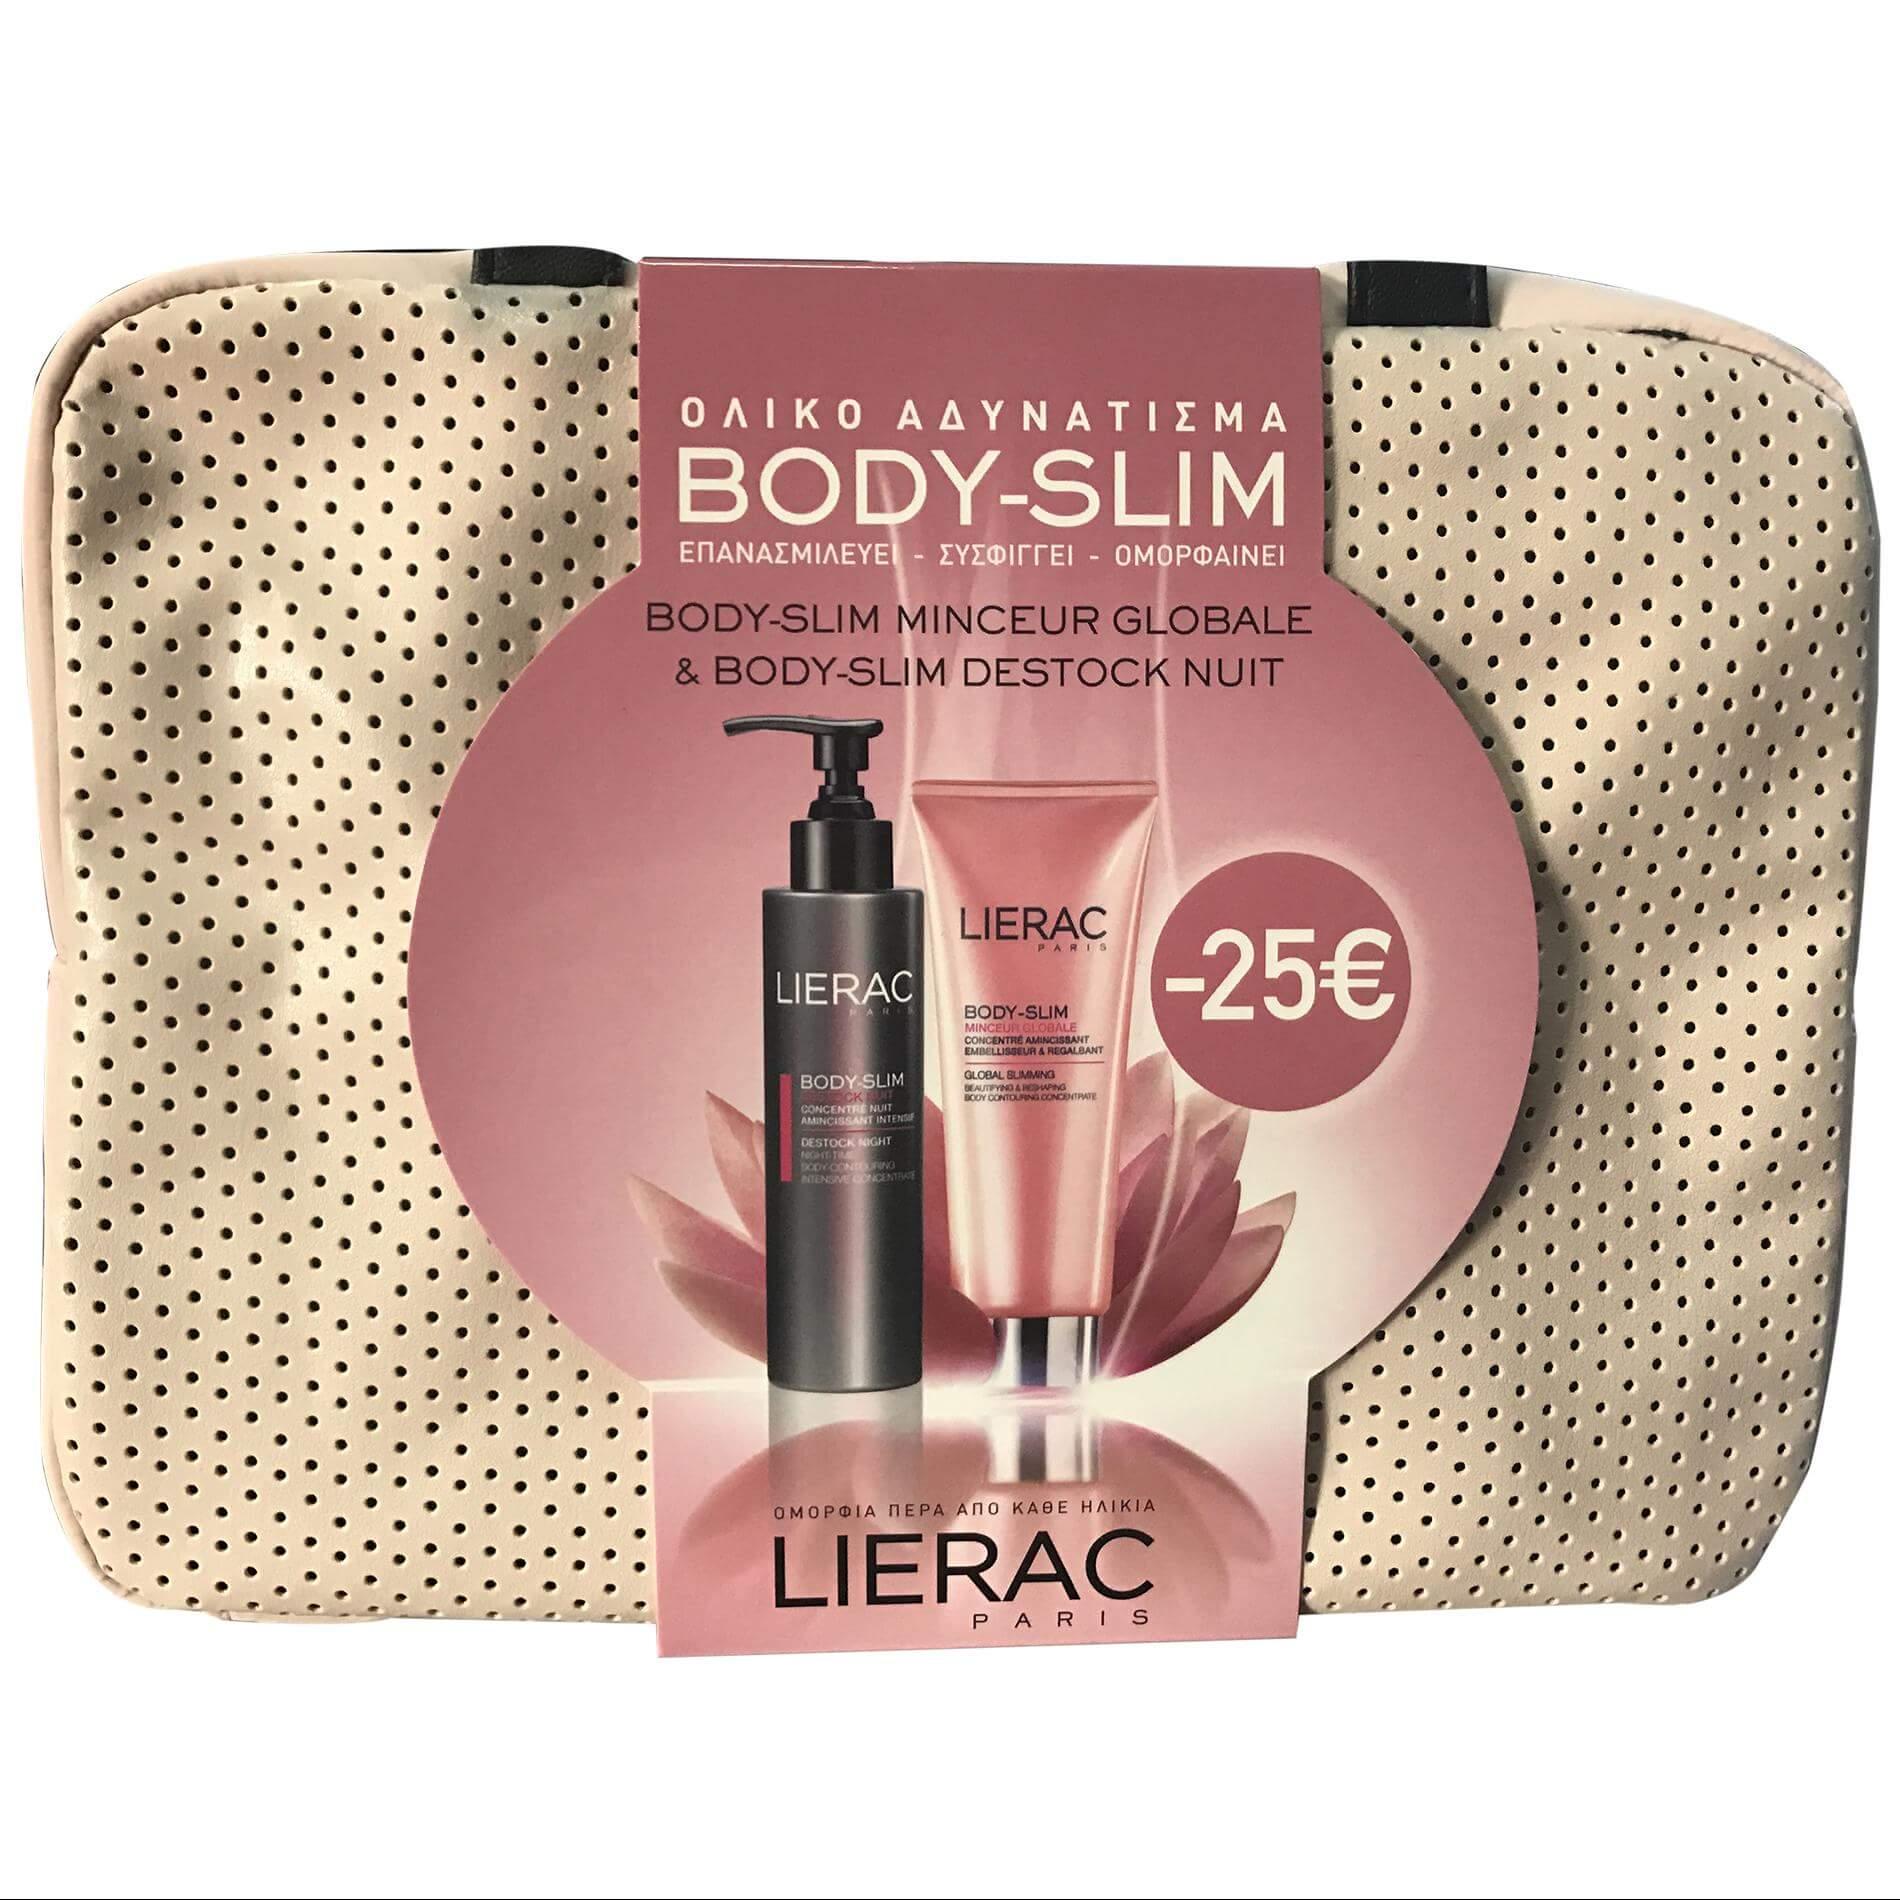 Lierac Πακέτο Προσφοράς Body Slim Destock Nuit Λιποδιαλυτικό Νυκτός 200ml & Body Slim Minceur Globale 200ml